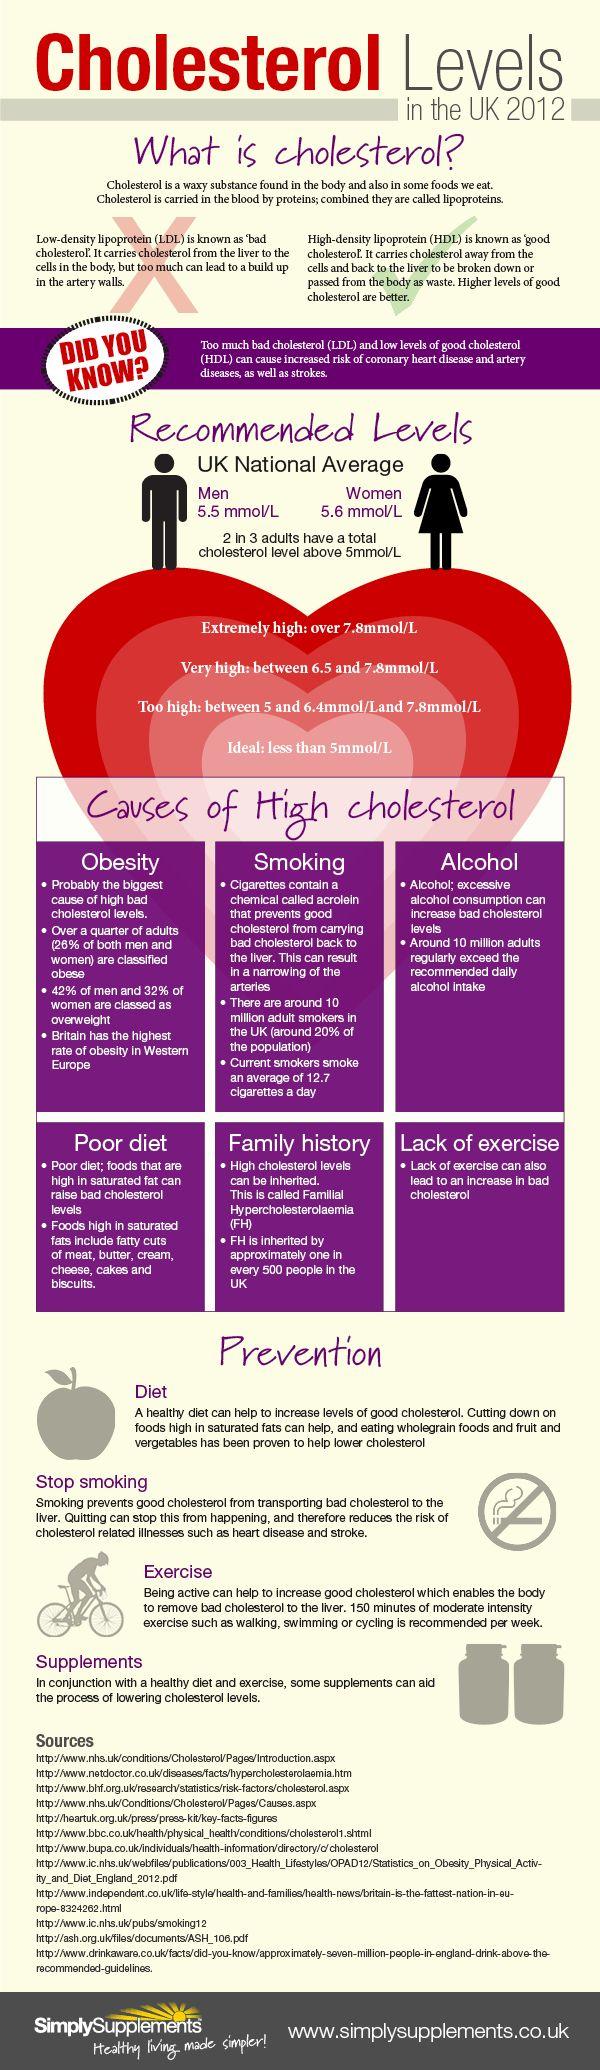 cholesterol levels - photo #11